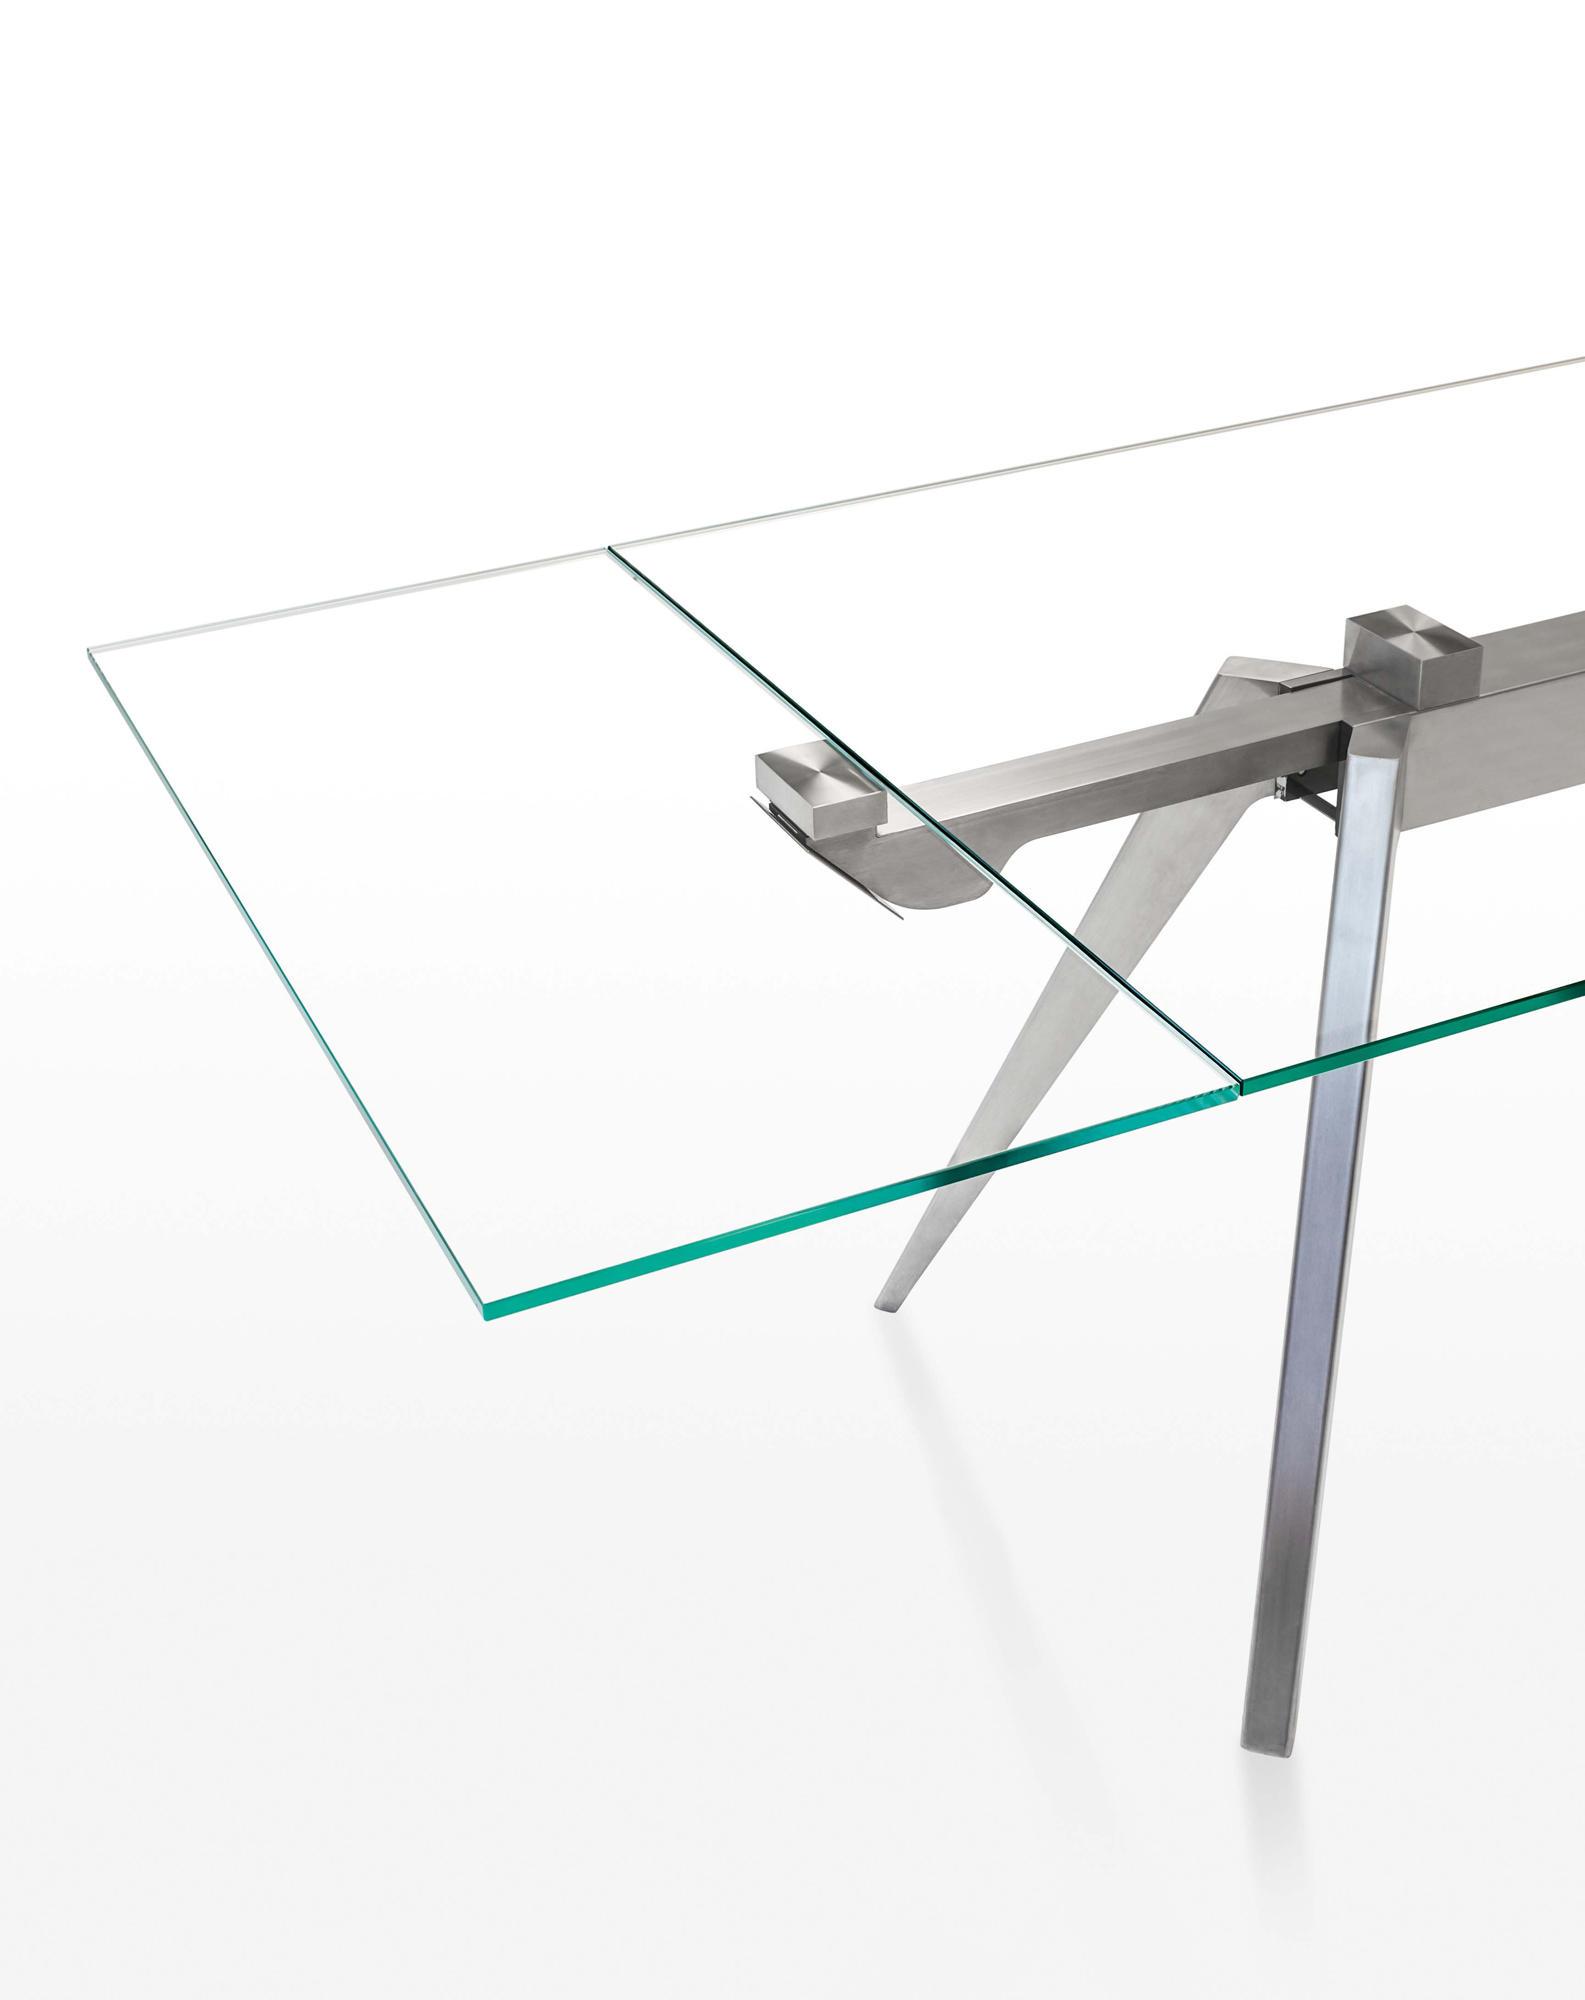 Delta Extendible Designer Furniture Architonic